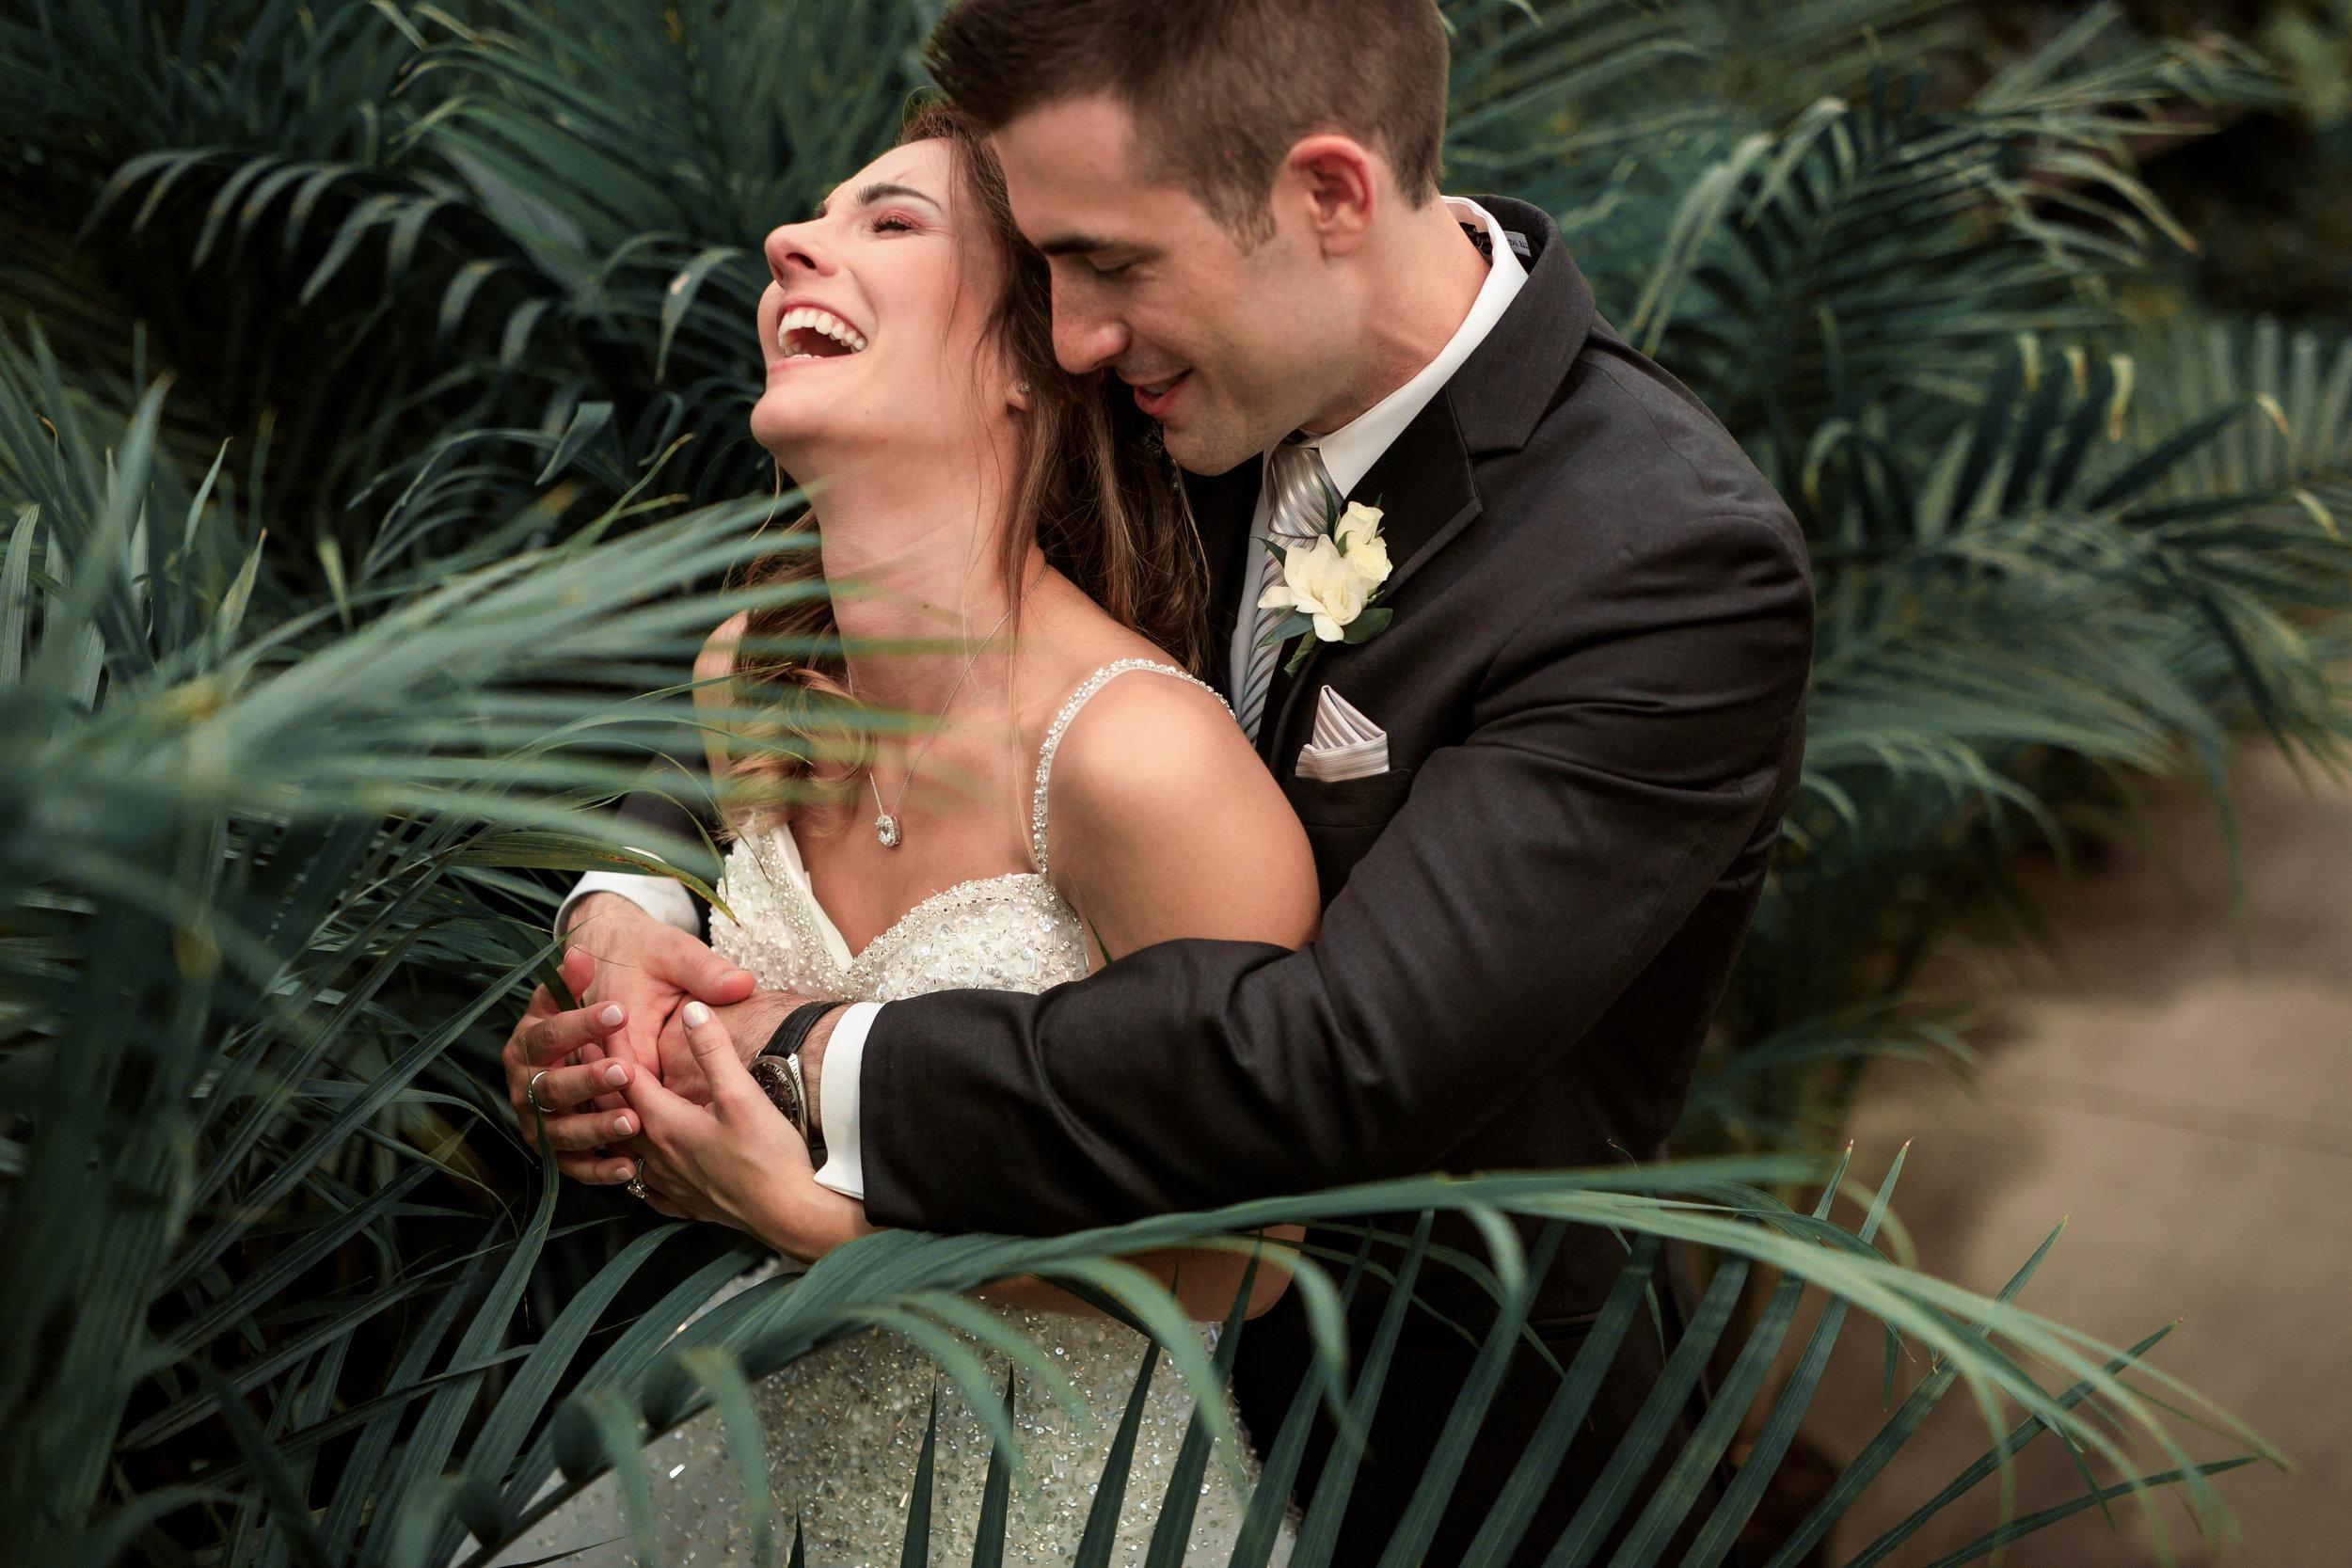 Wedding-couple-takes-photos-at-lowes-hardware-due-to-rain14.jpg